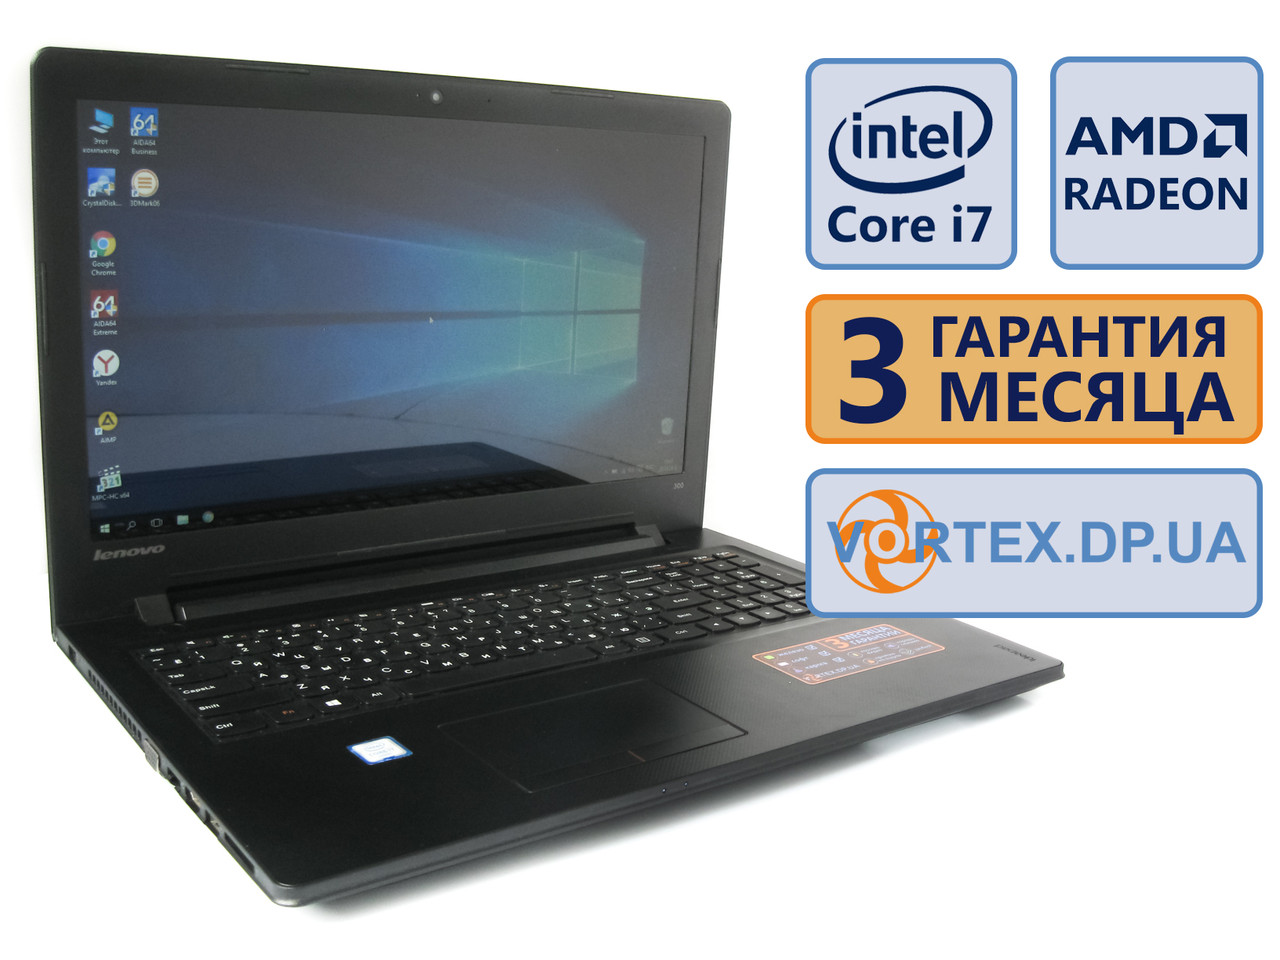 Ноутбук Lenovo Ideapad 300-15isk 15.6 (1366х768) / Intel Core i7-6500U